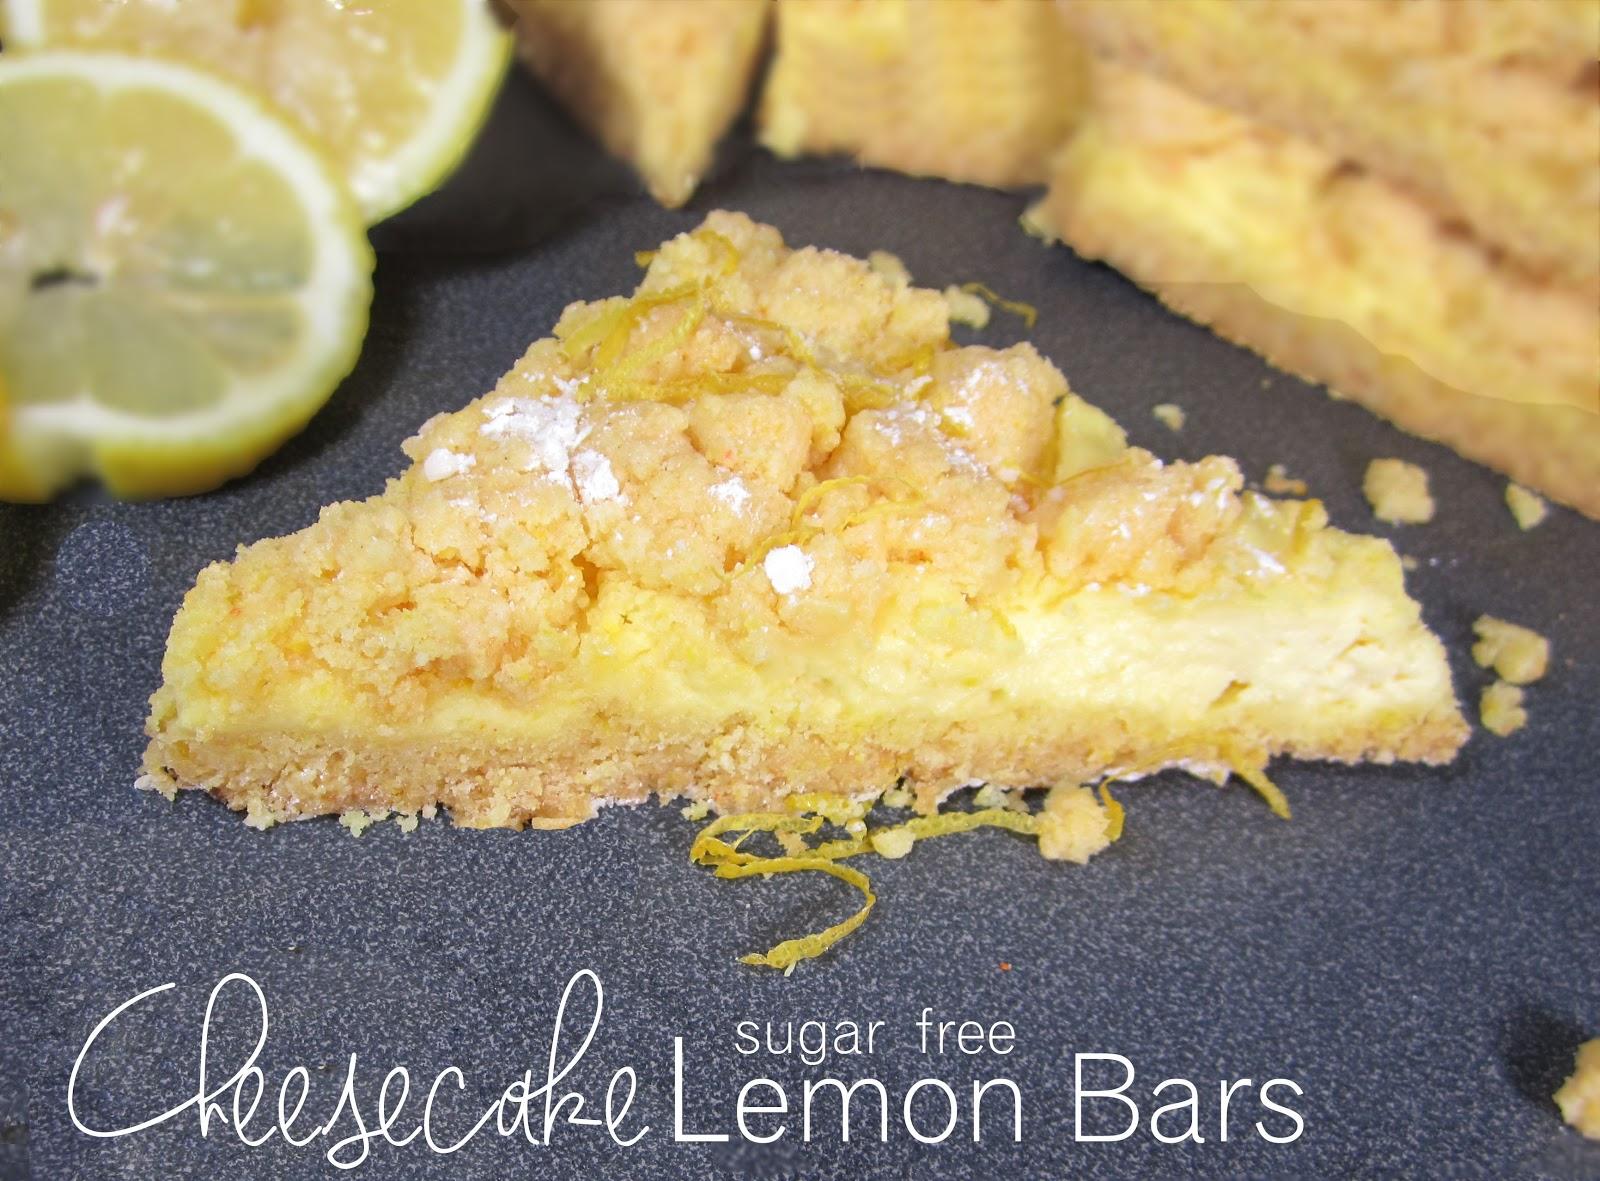 365 Designs Sugar Free Lemon Cheesecake Bars With Splenda